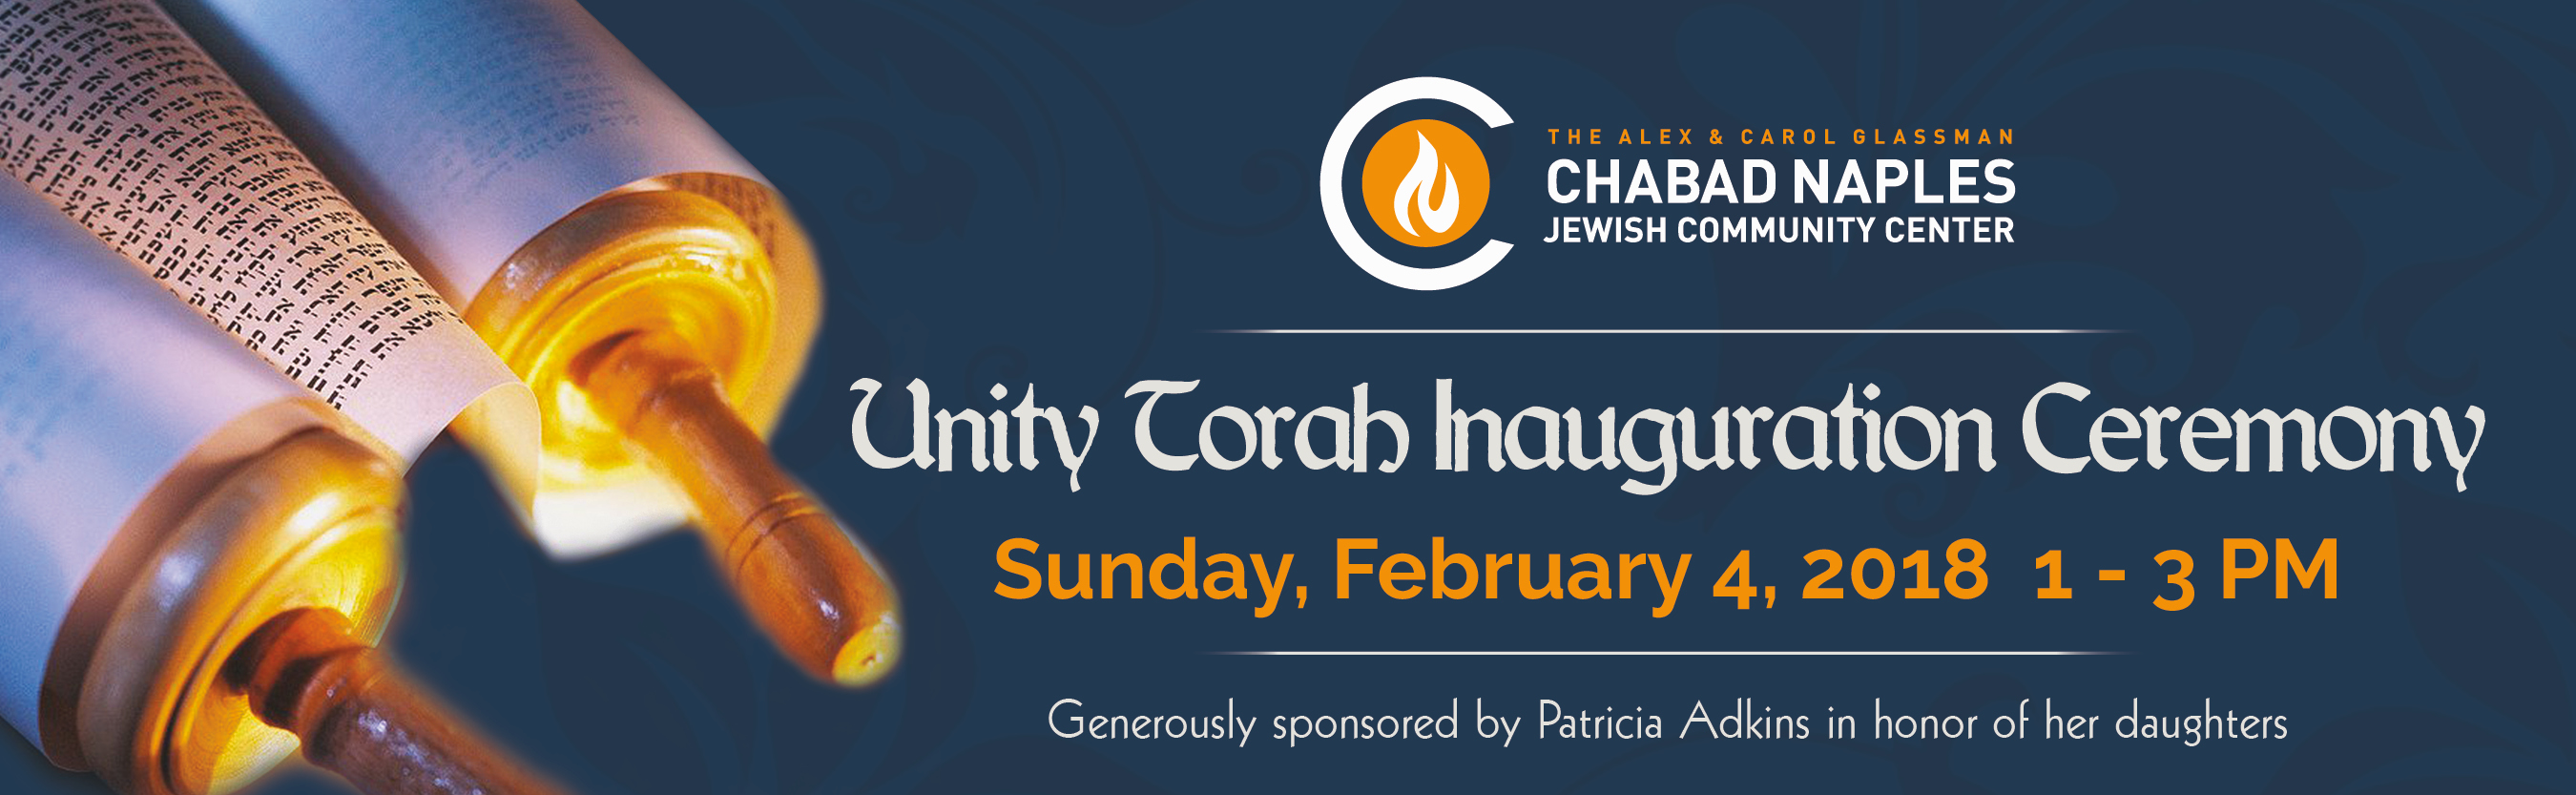 ChabadNaples-Unity-Torah-2018_Mini-Site-Header.jpg